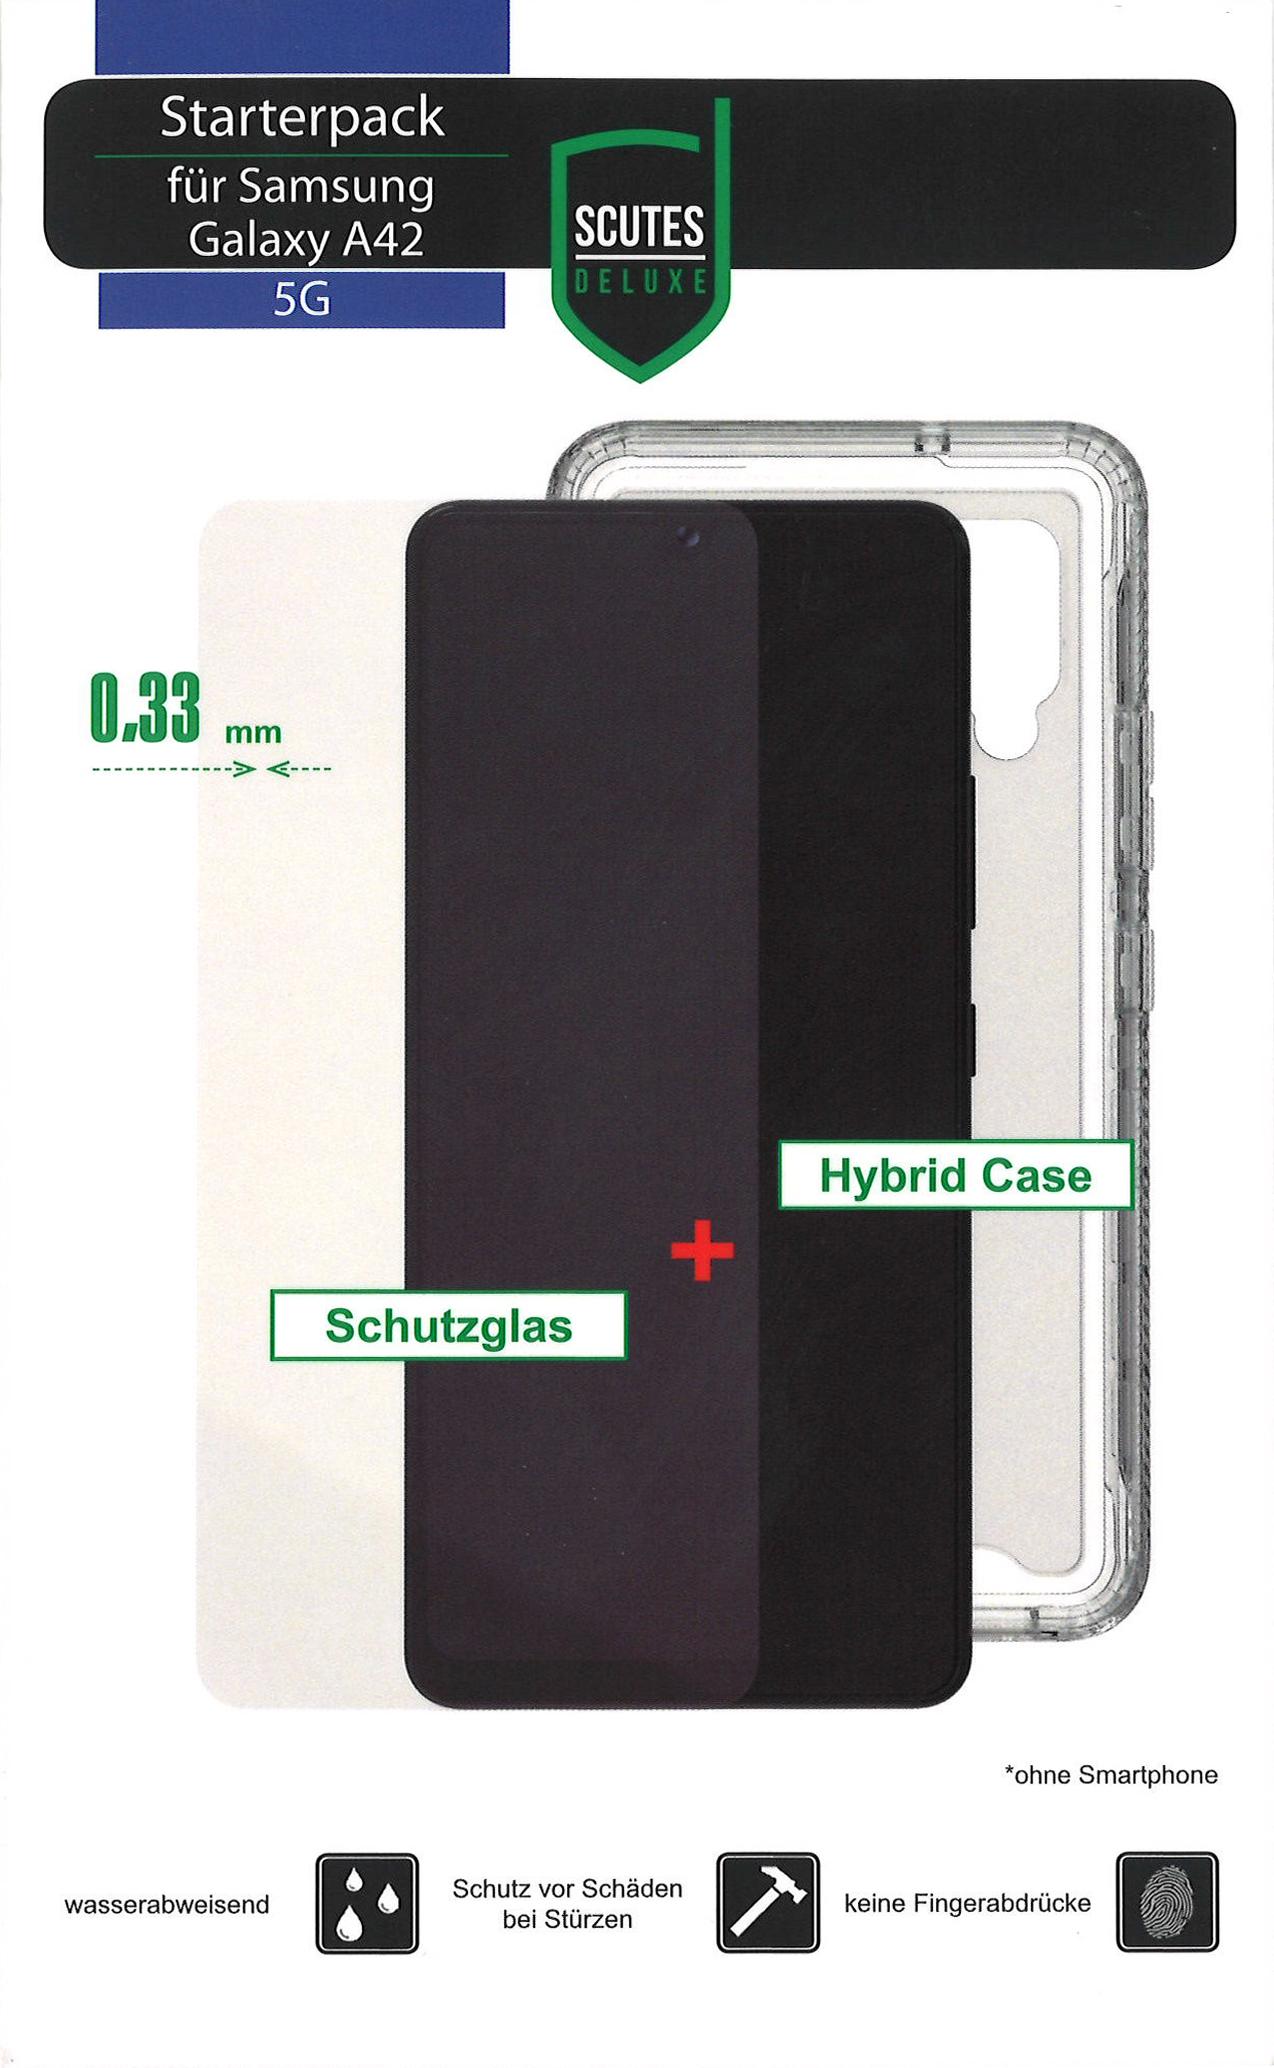 Starterpack (Samsung Galaxy A42)